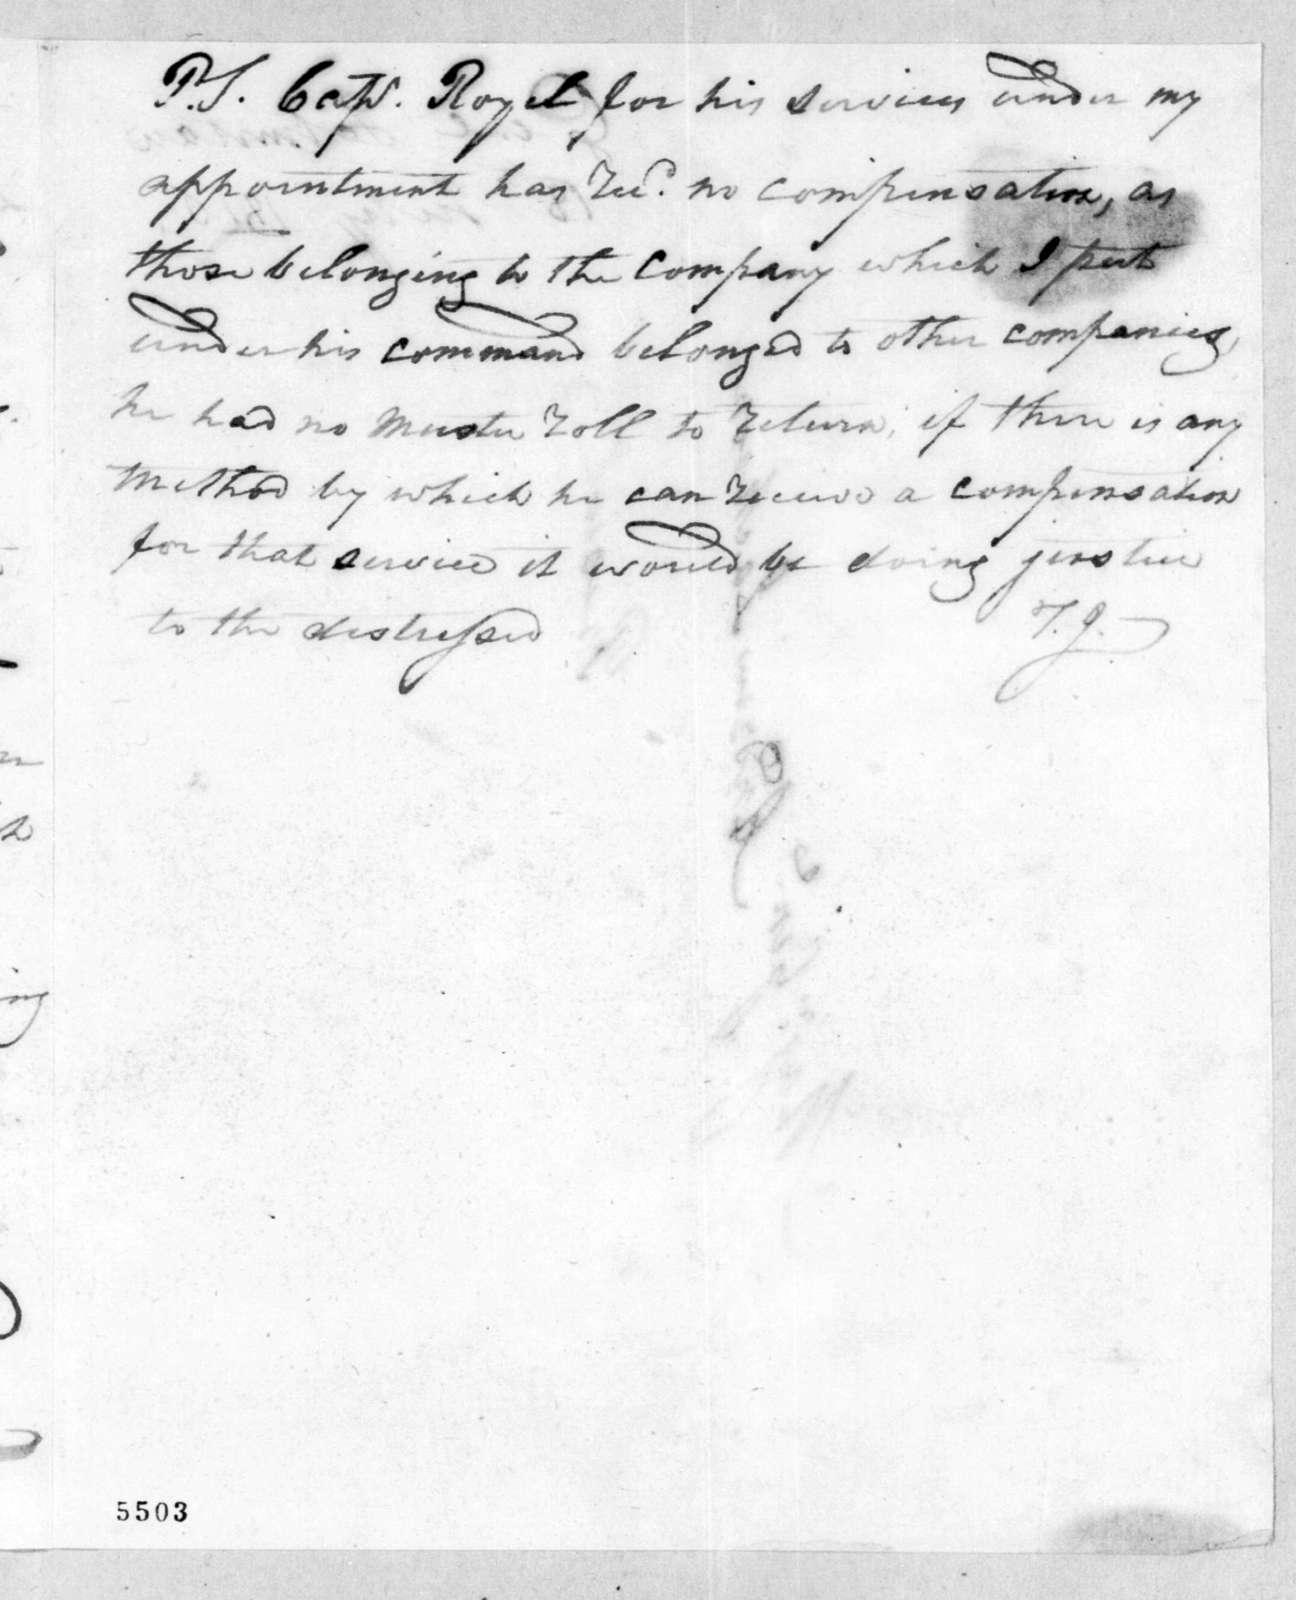 Thomas Johnson to Andrew Jackson, July 18, 1816